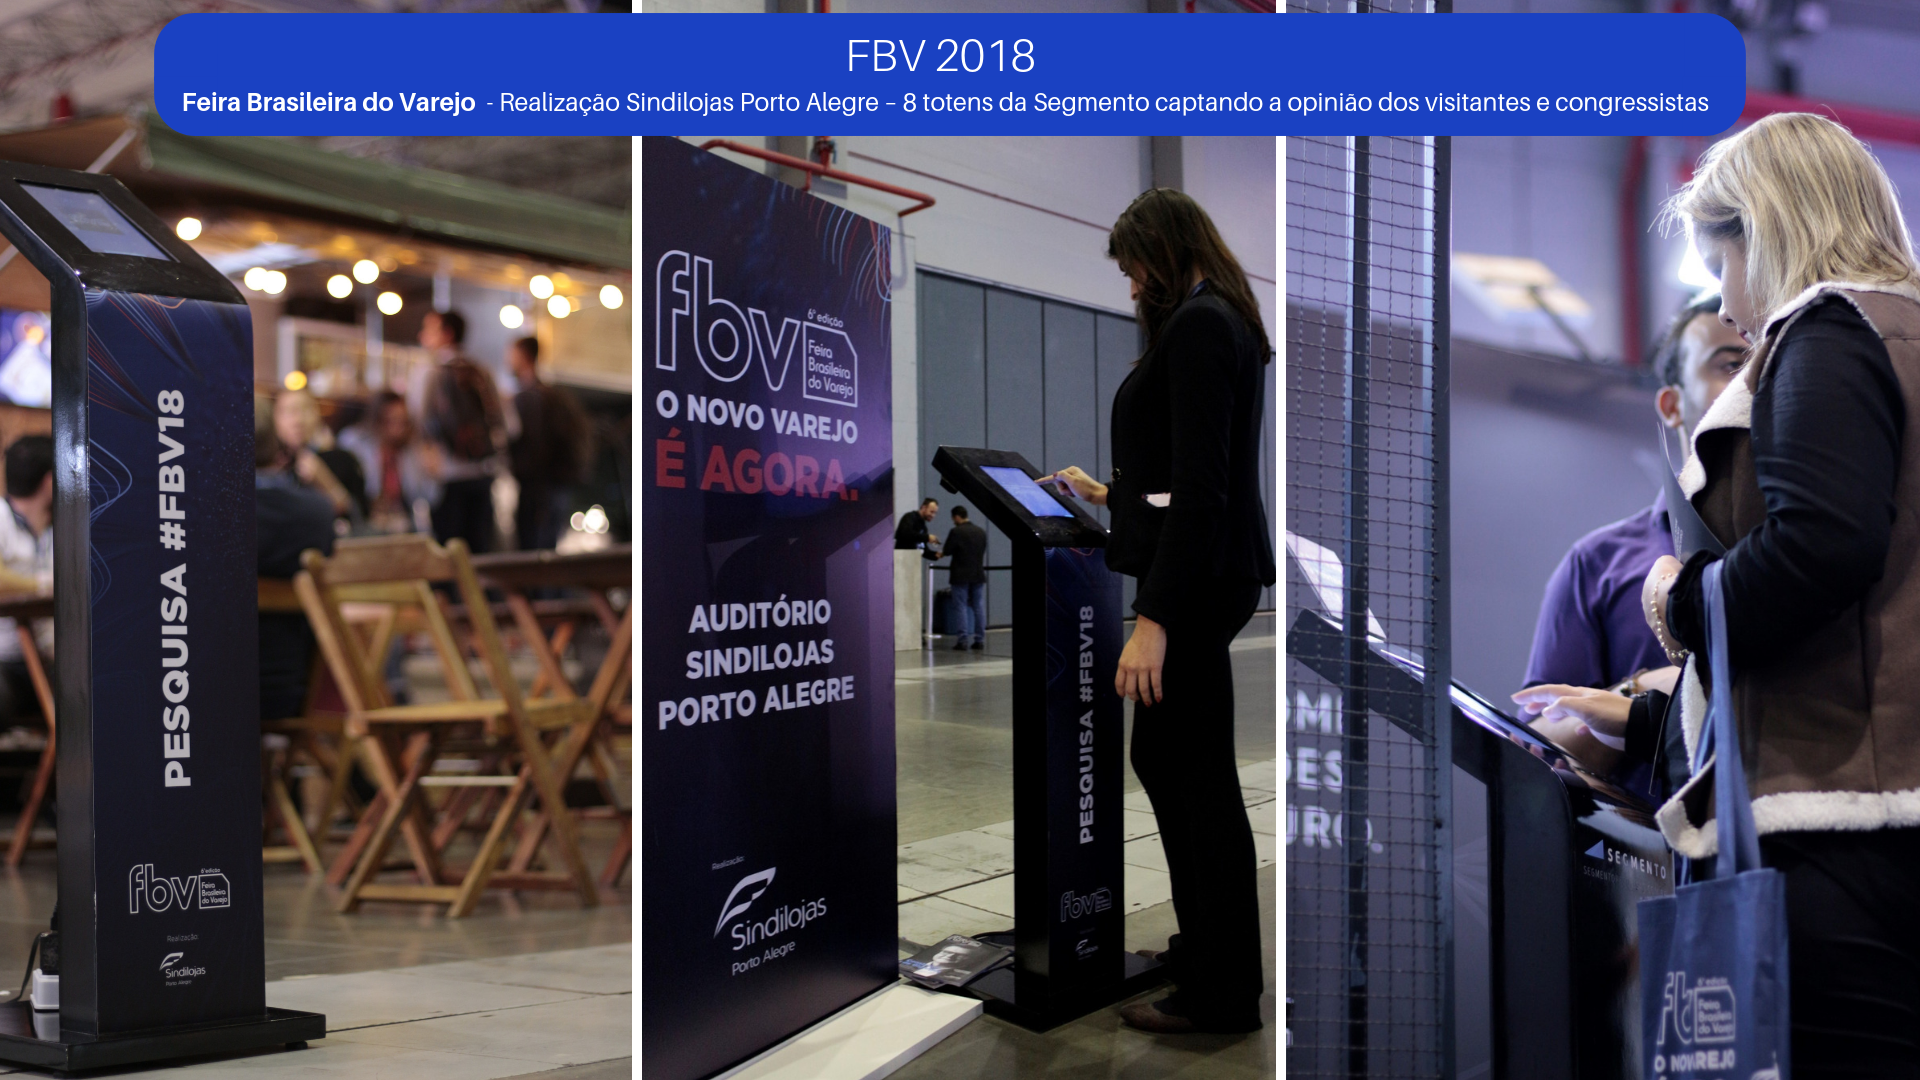 FBV 2018